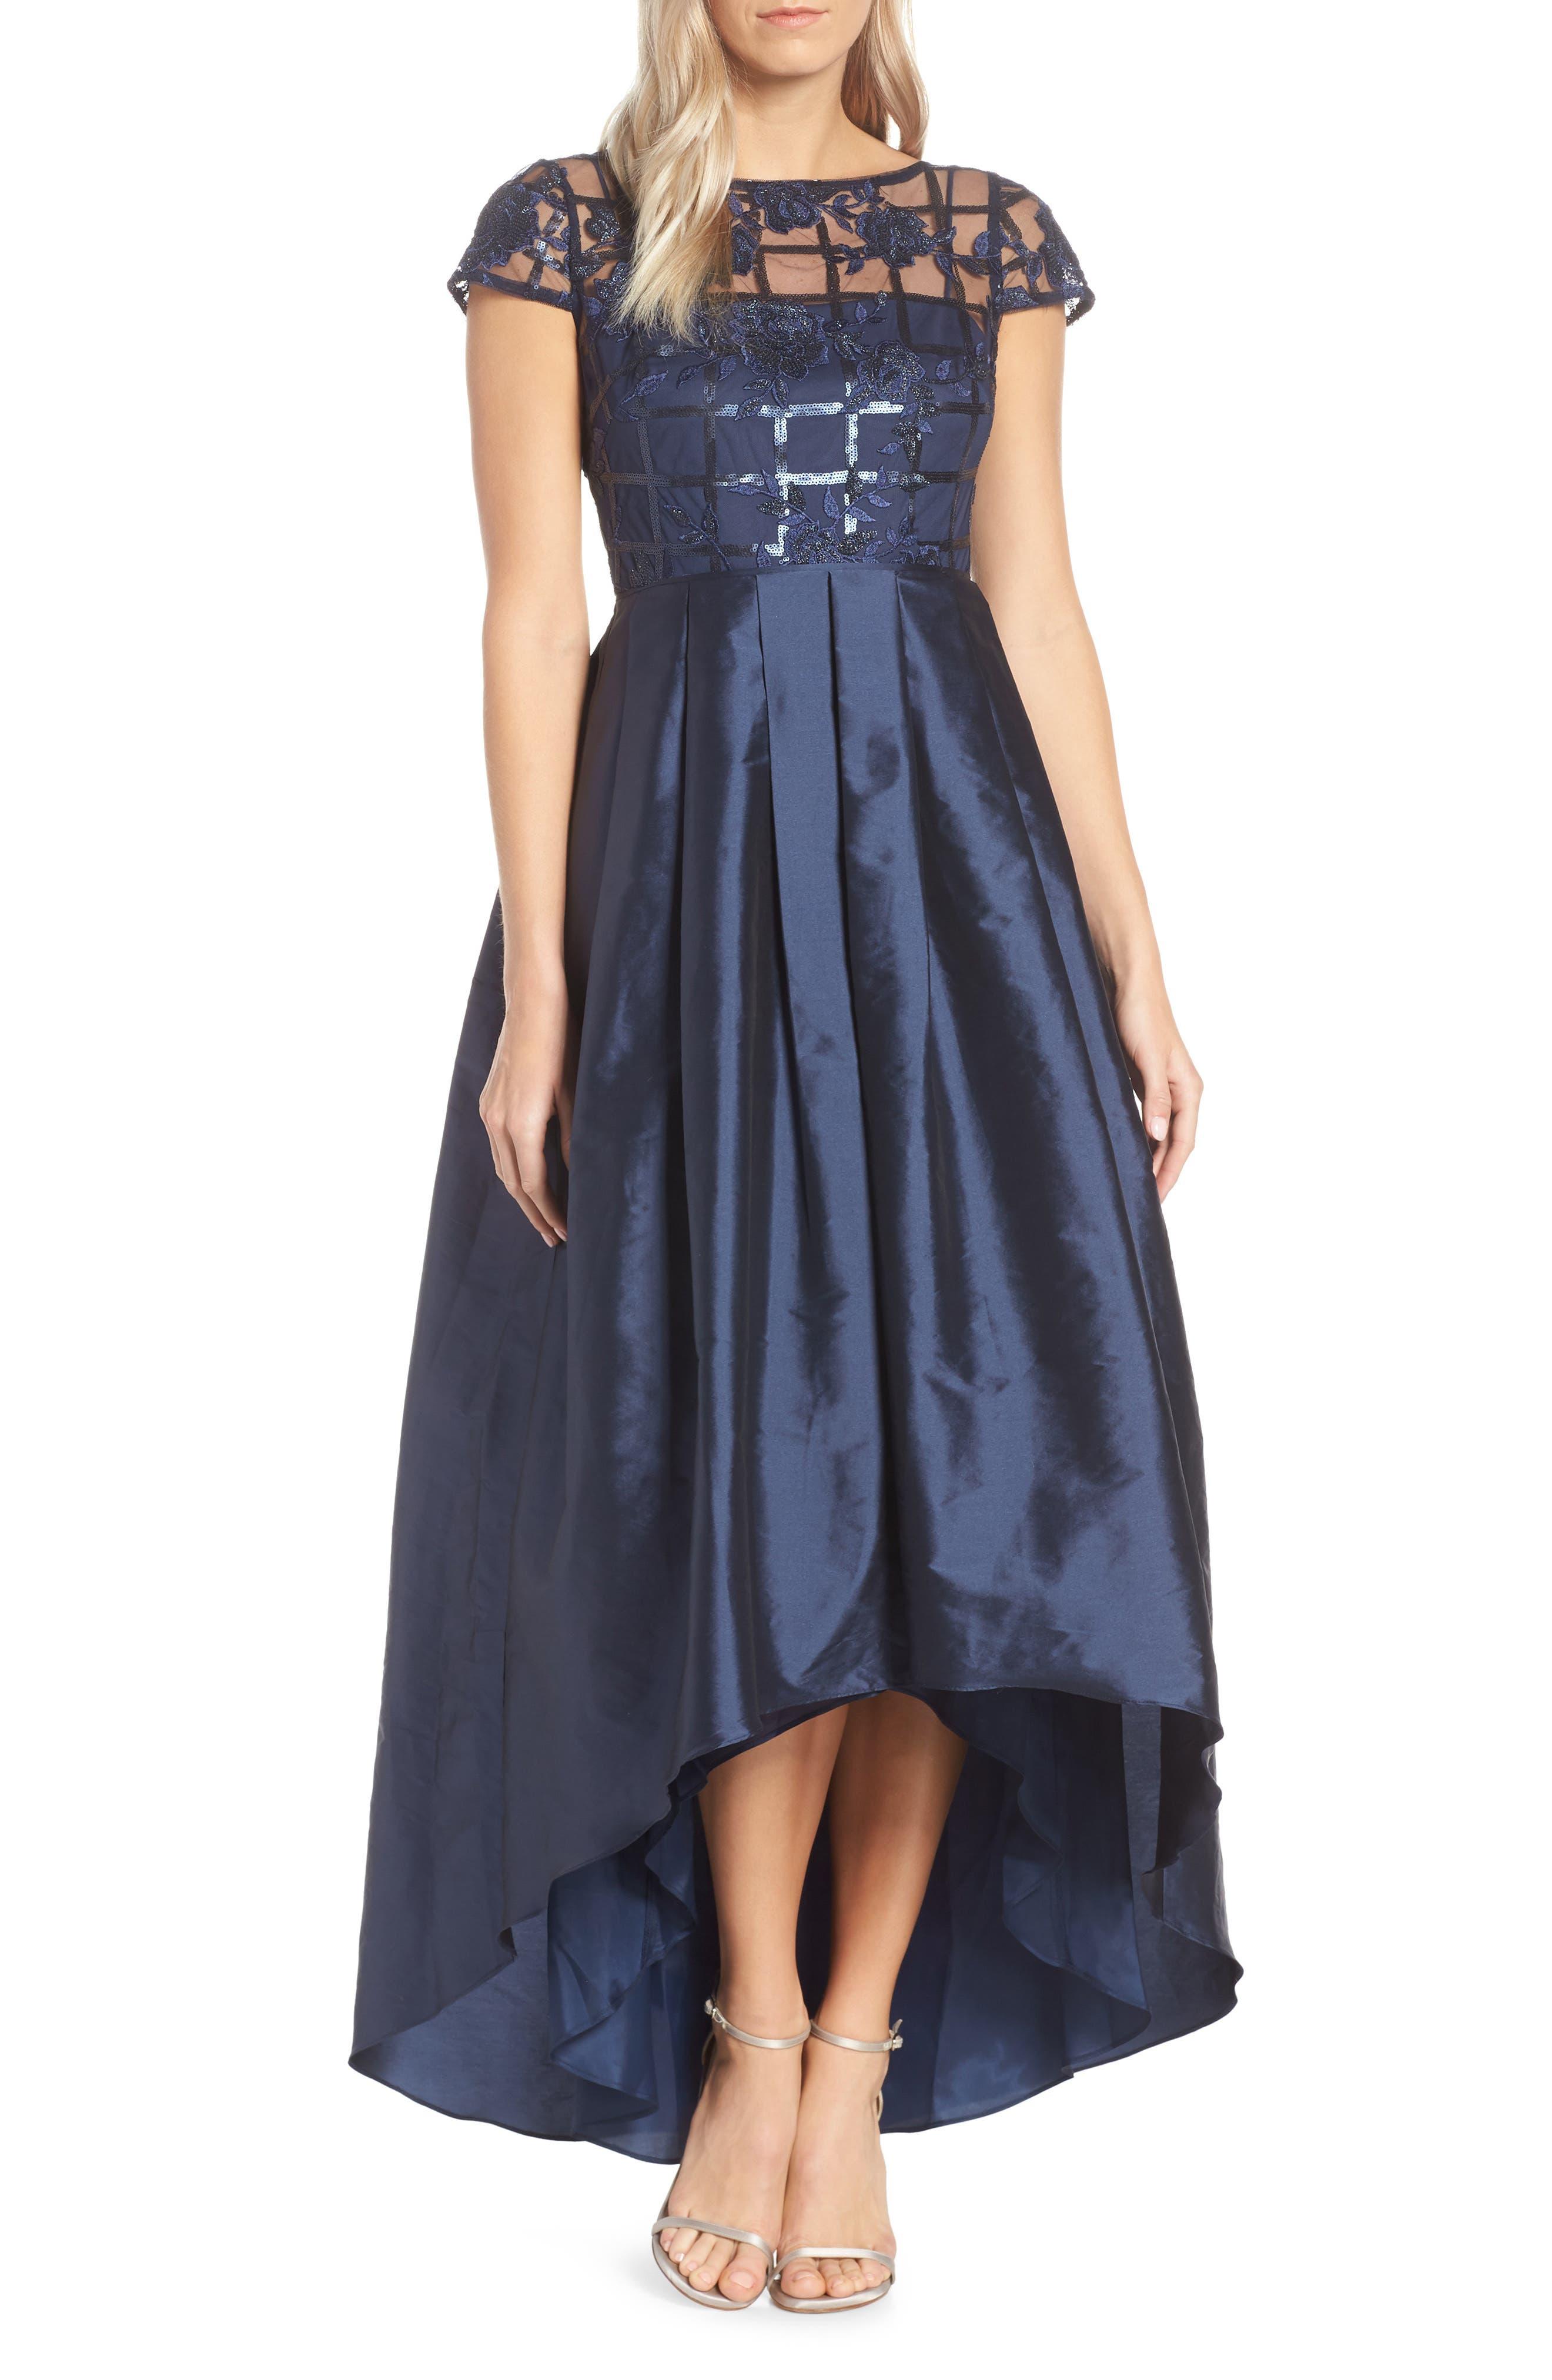 Adrianna Papell Sequin Evening Dress, Blue